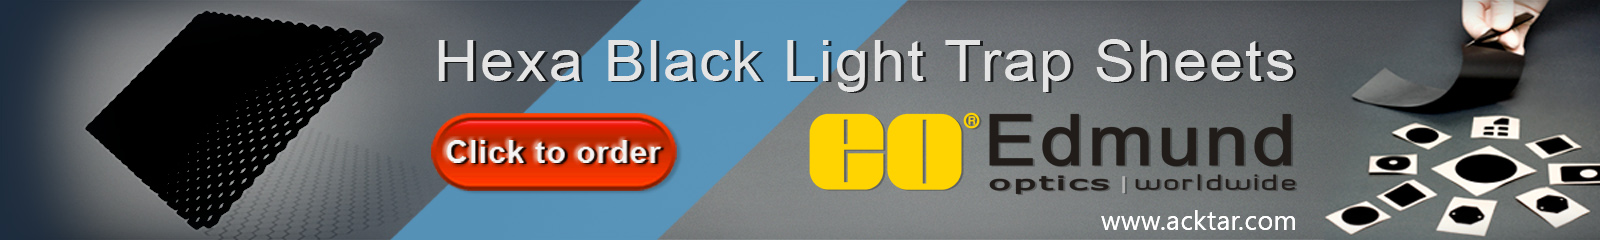 hexa black light trap sheets banner